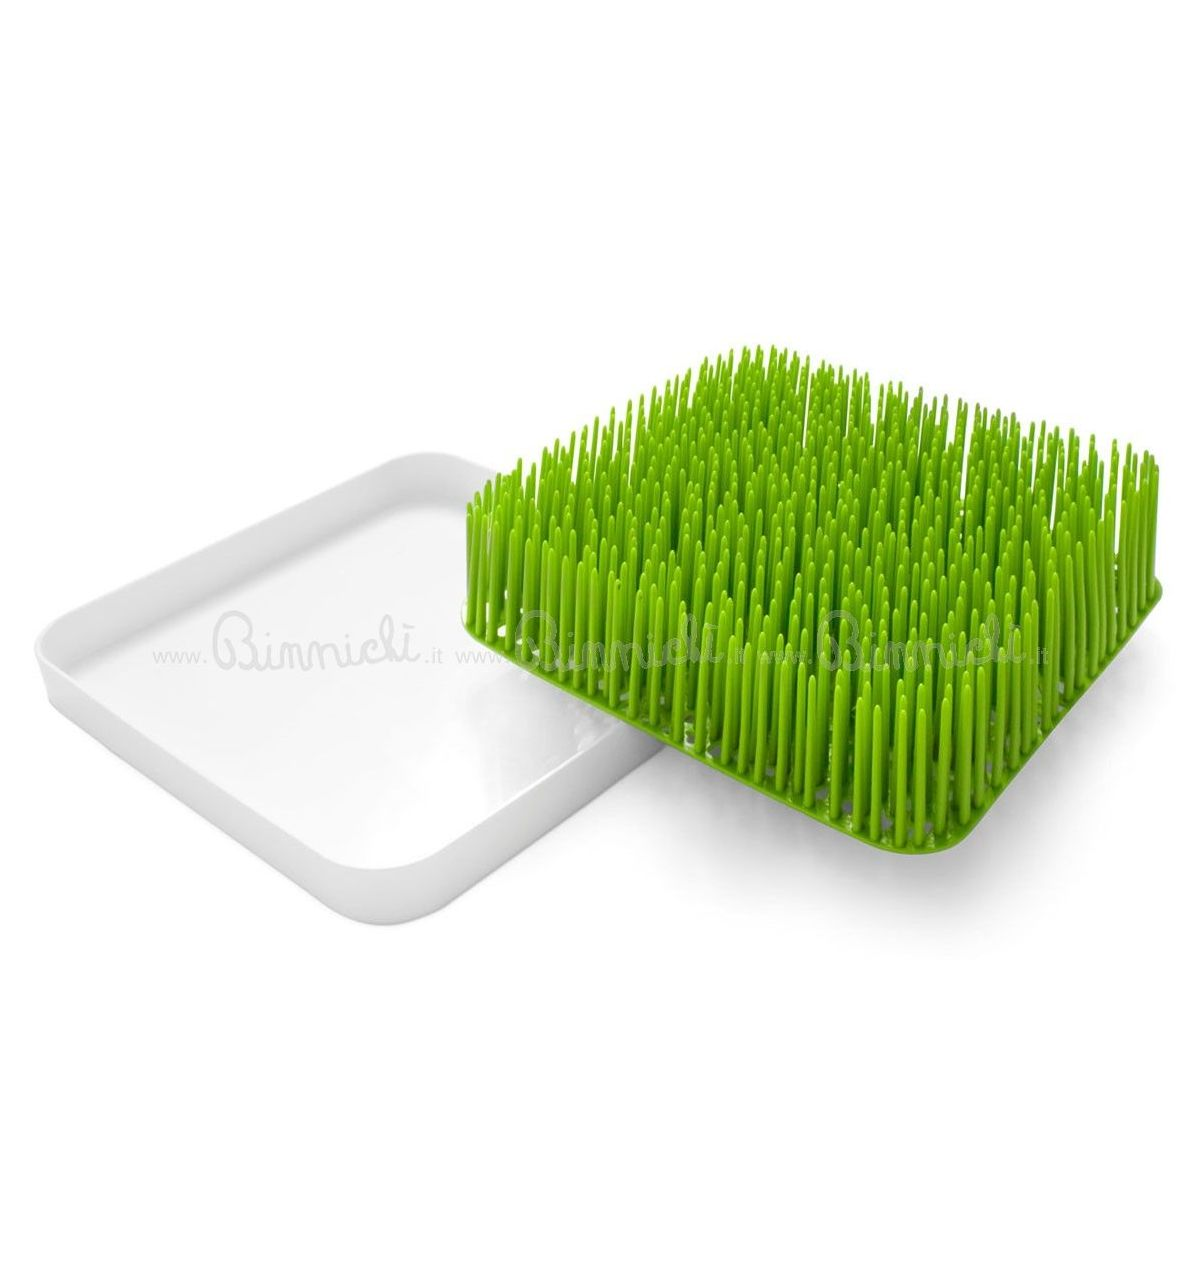 boon grass stem countertop drying rack. Black Bedroom Furniture Sets. Home Design Ideas